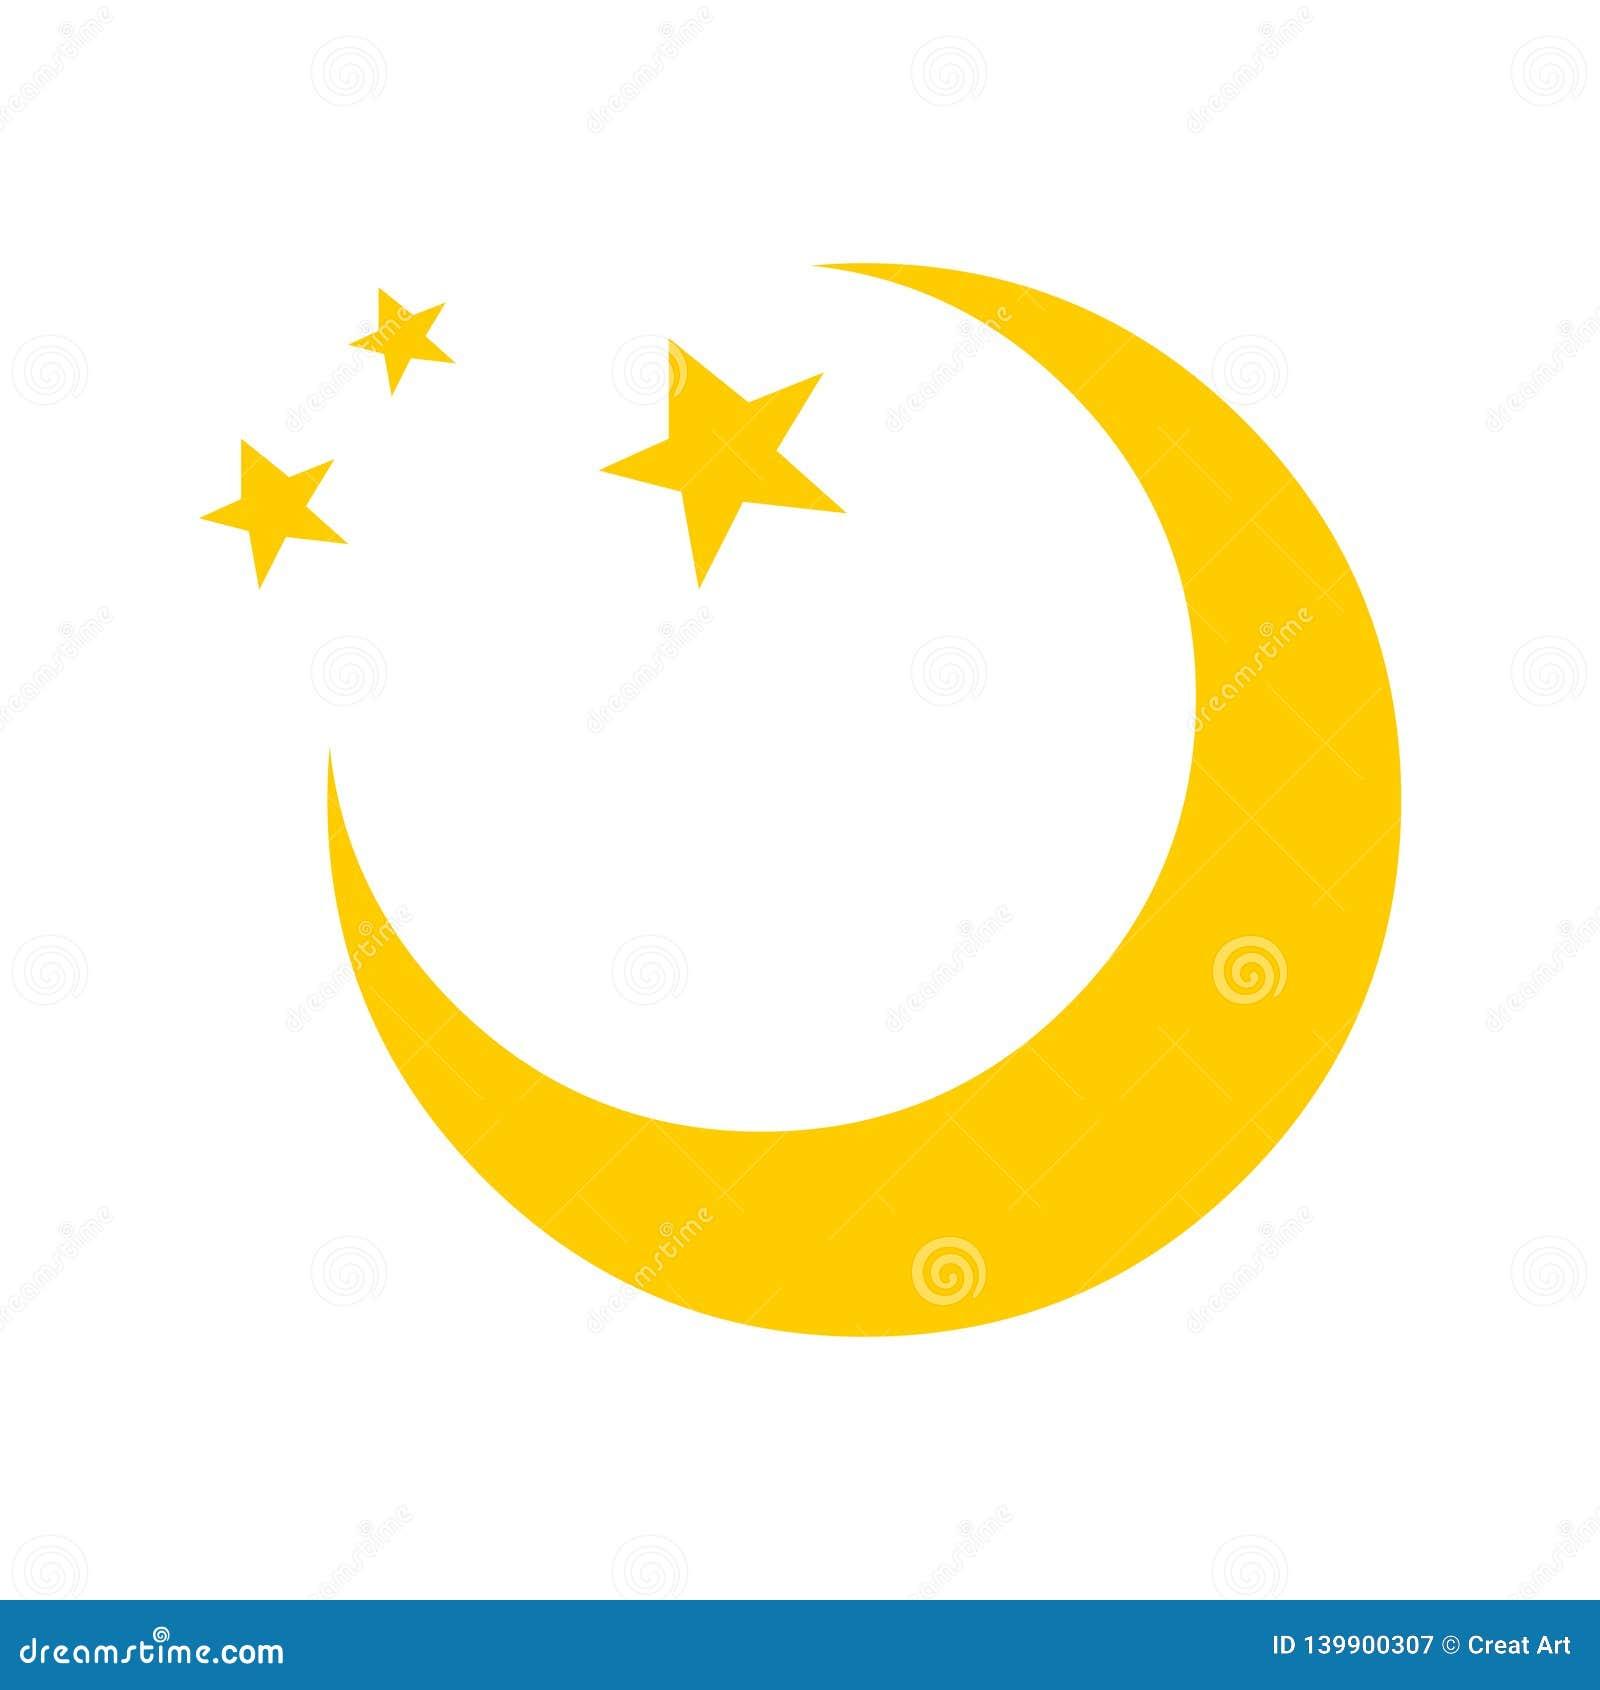 Moon vector icon logo.Moon and stars illustration